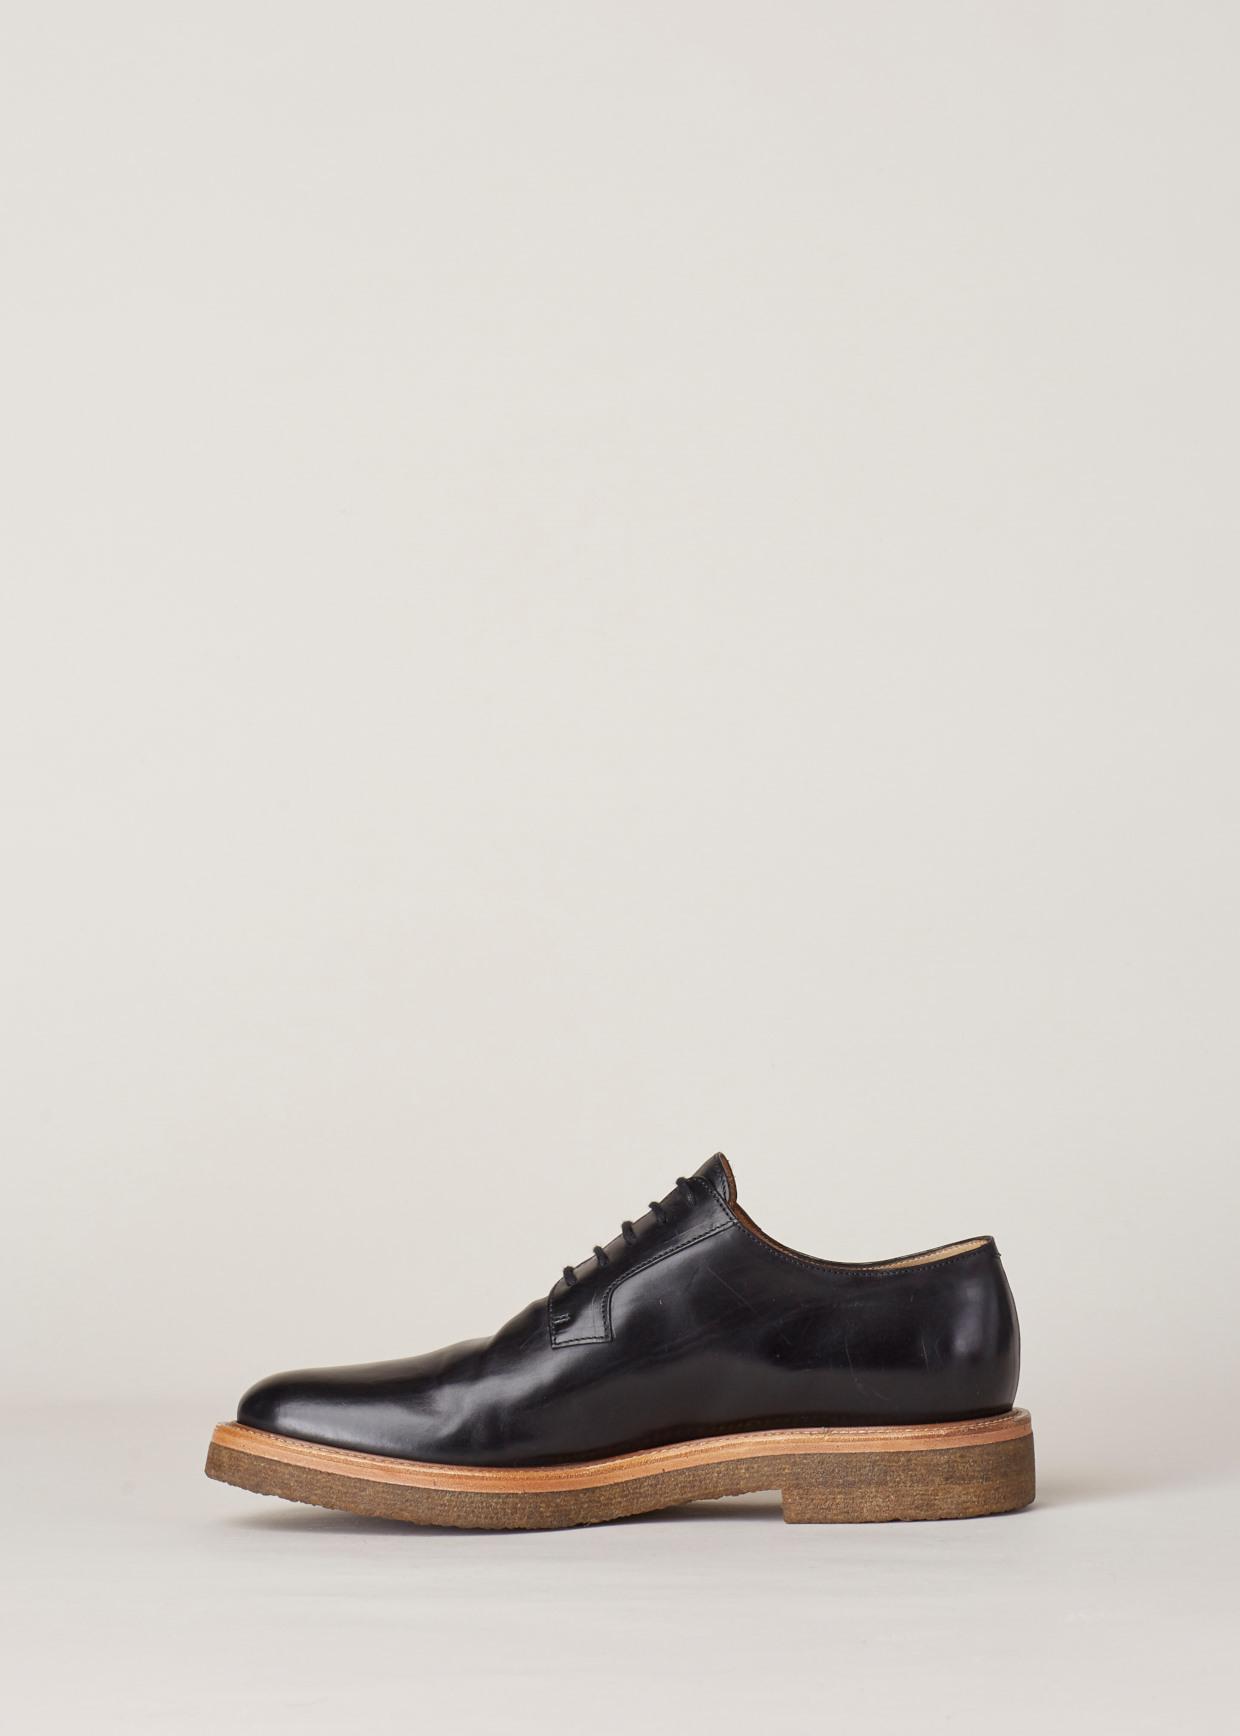 clearance popular Dries Van Noten Leather Brogue Oxfords amazing price sale online OYLfL